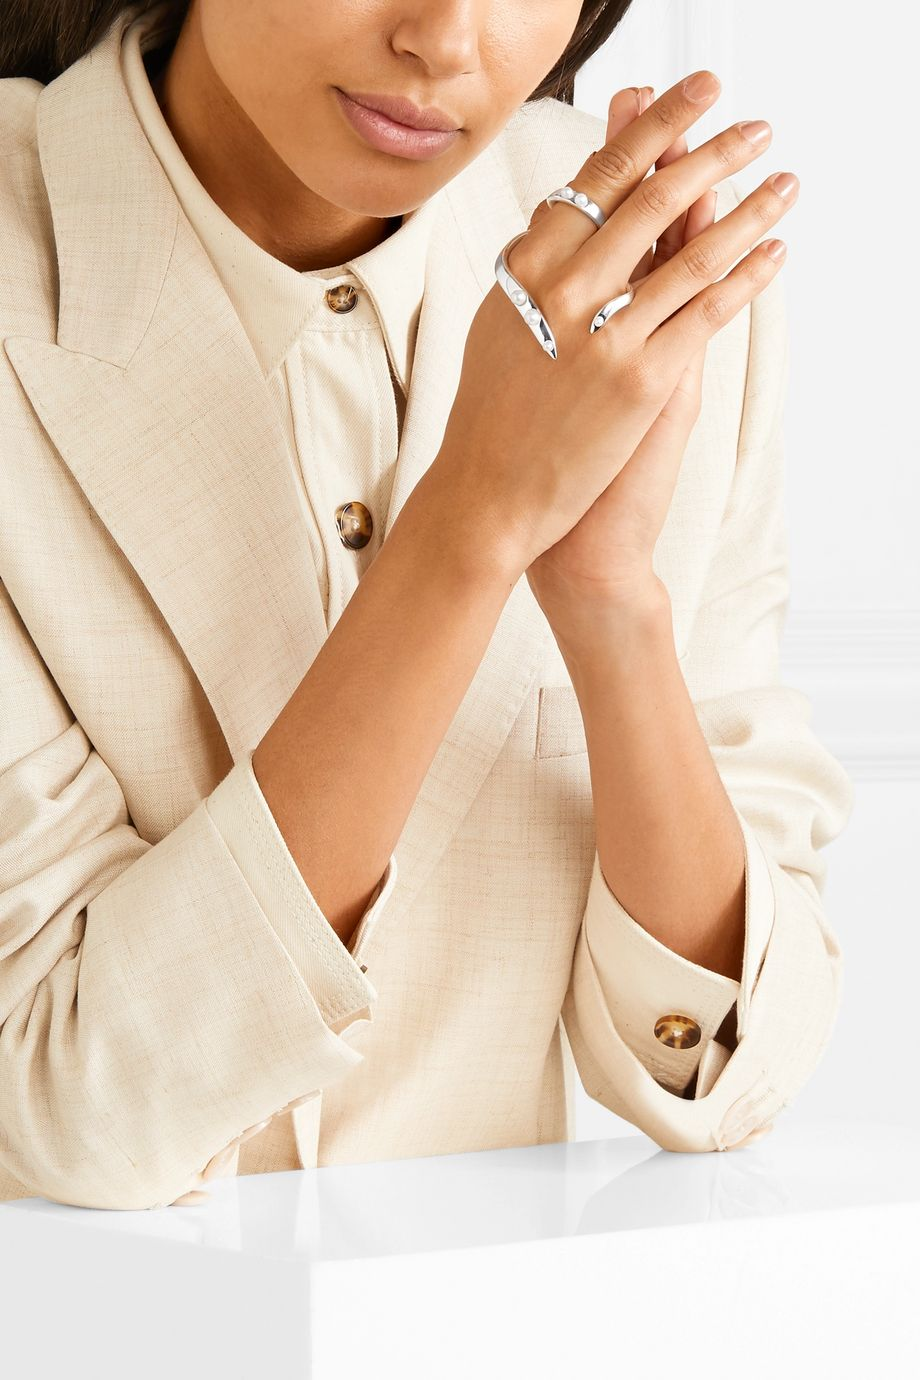 Anne Manns Eadie silver freshwater pearl ring